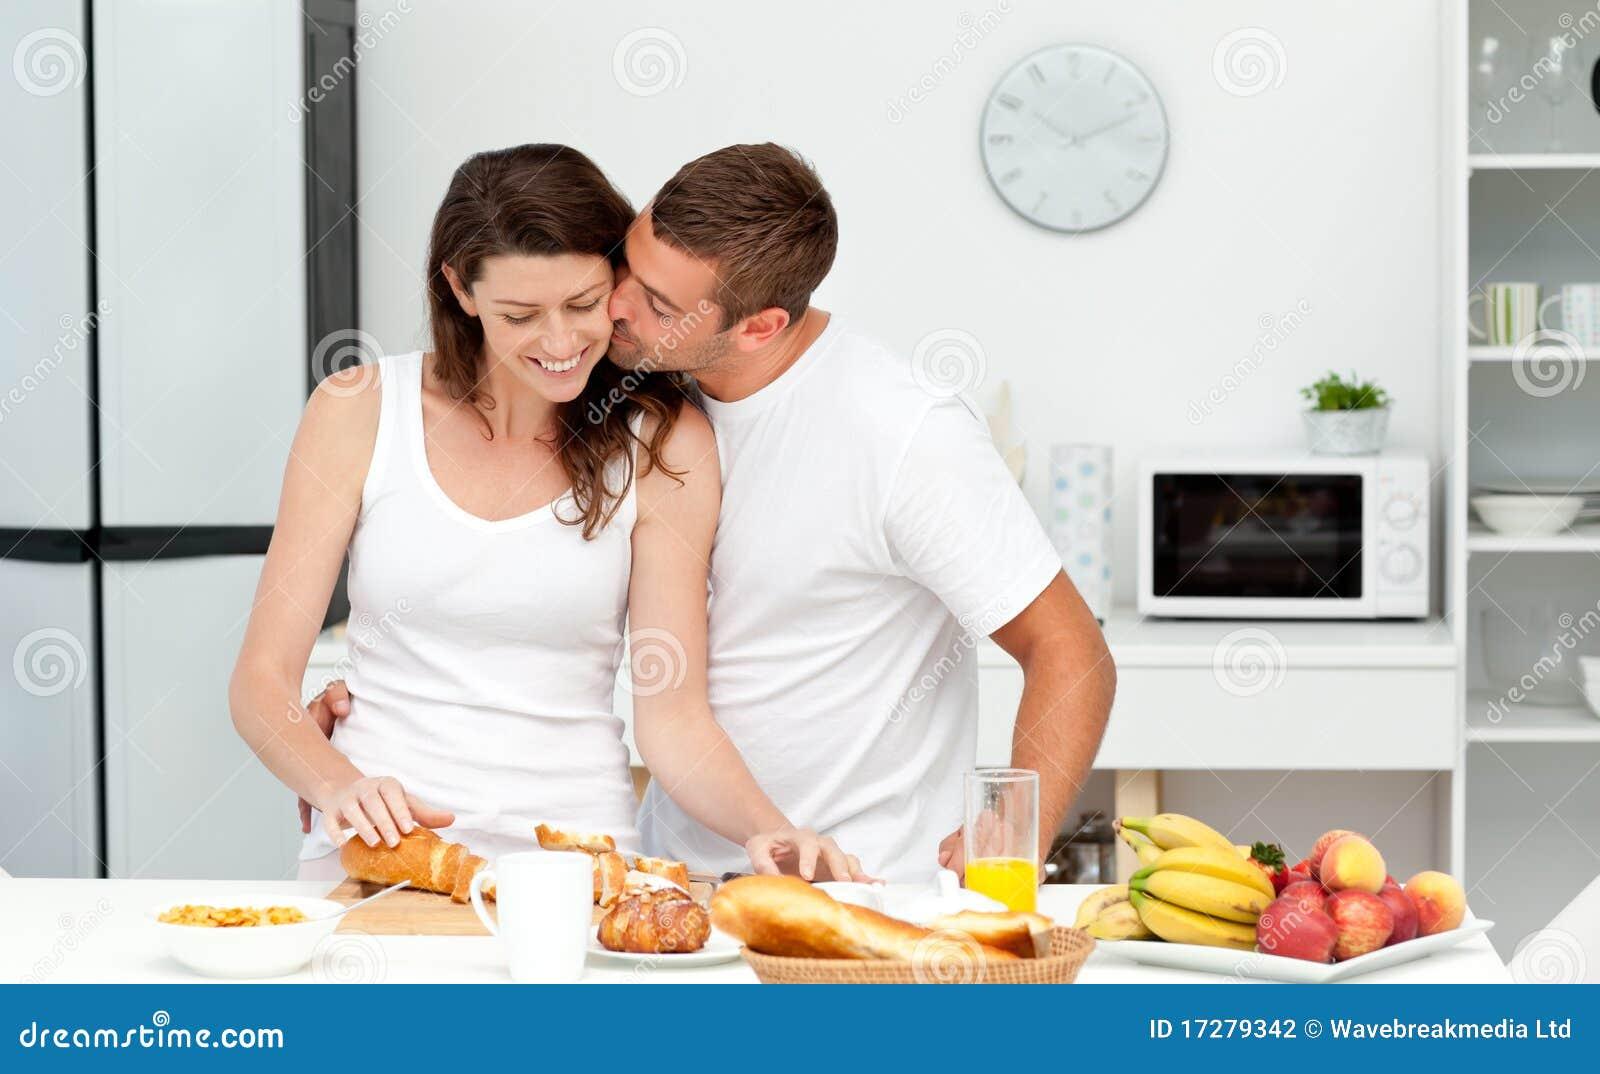 Девушка готовит завтрак любимому фото